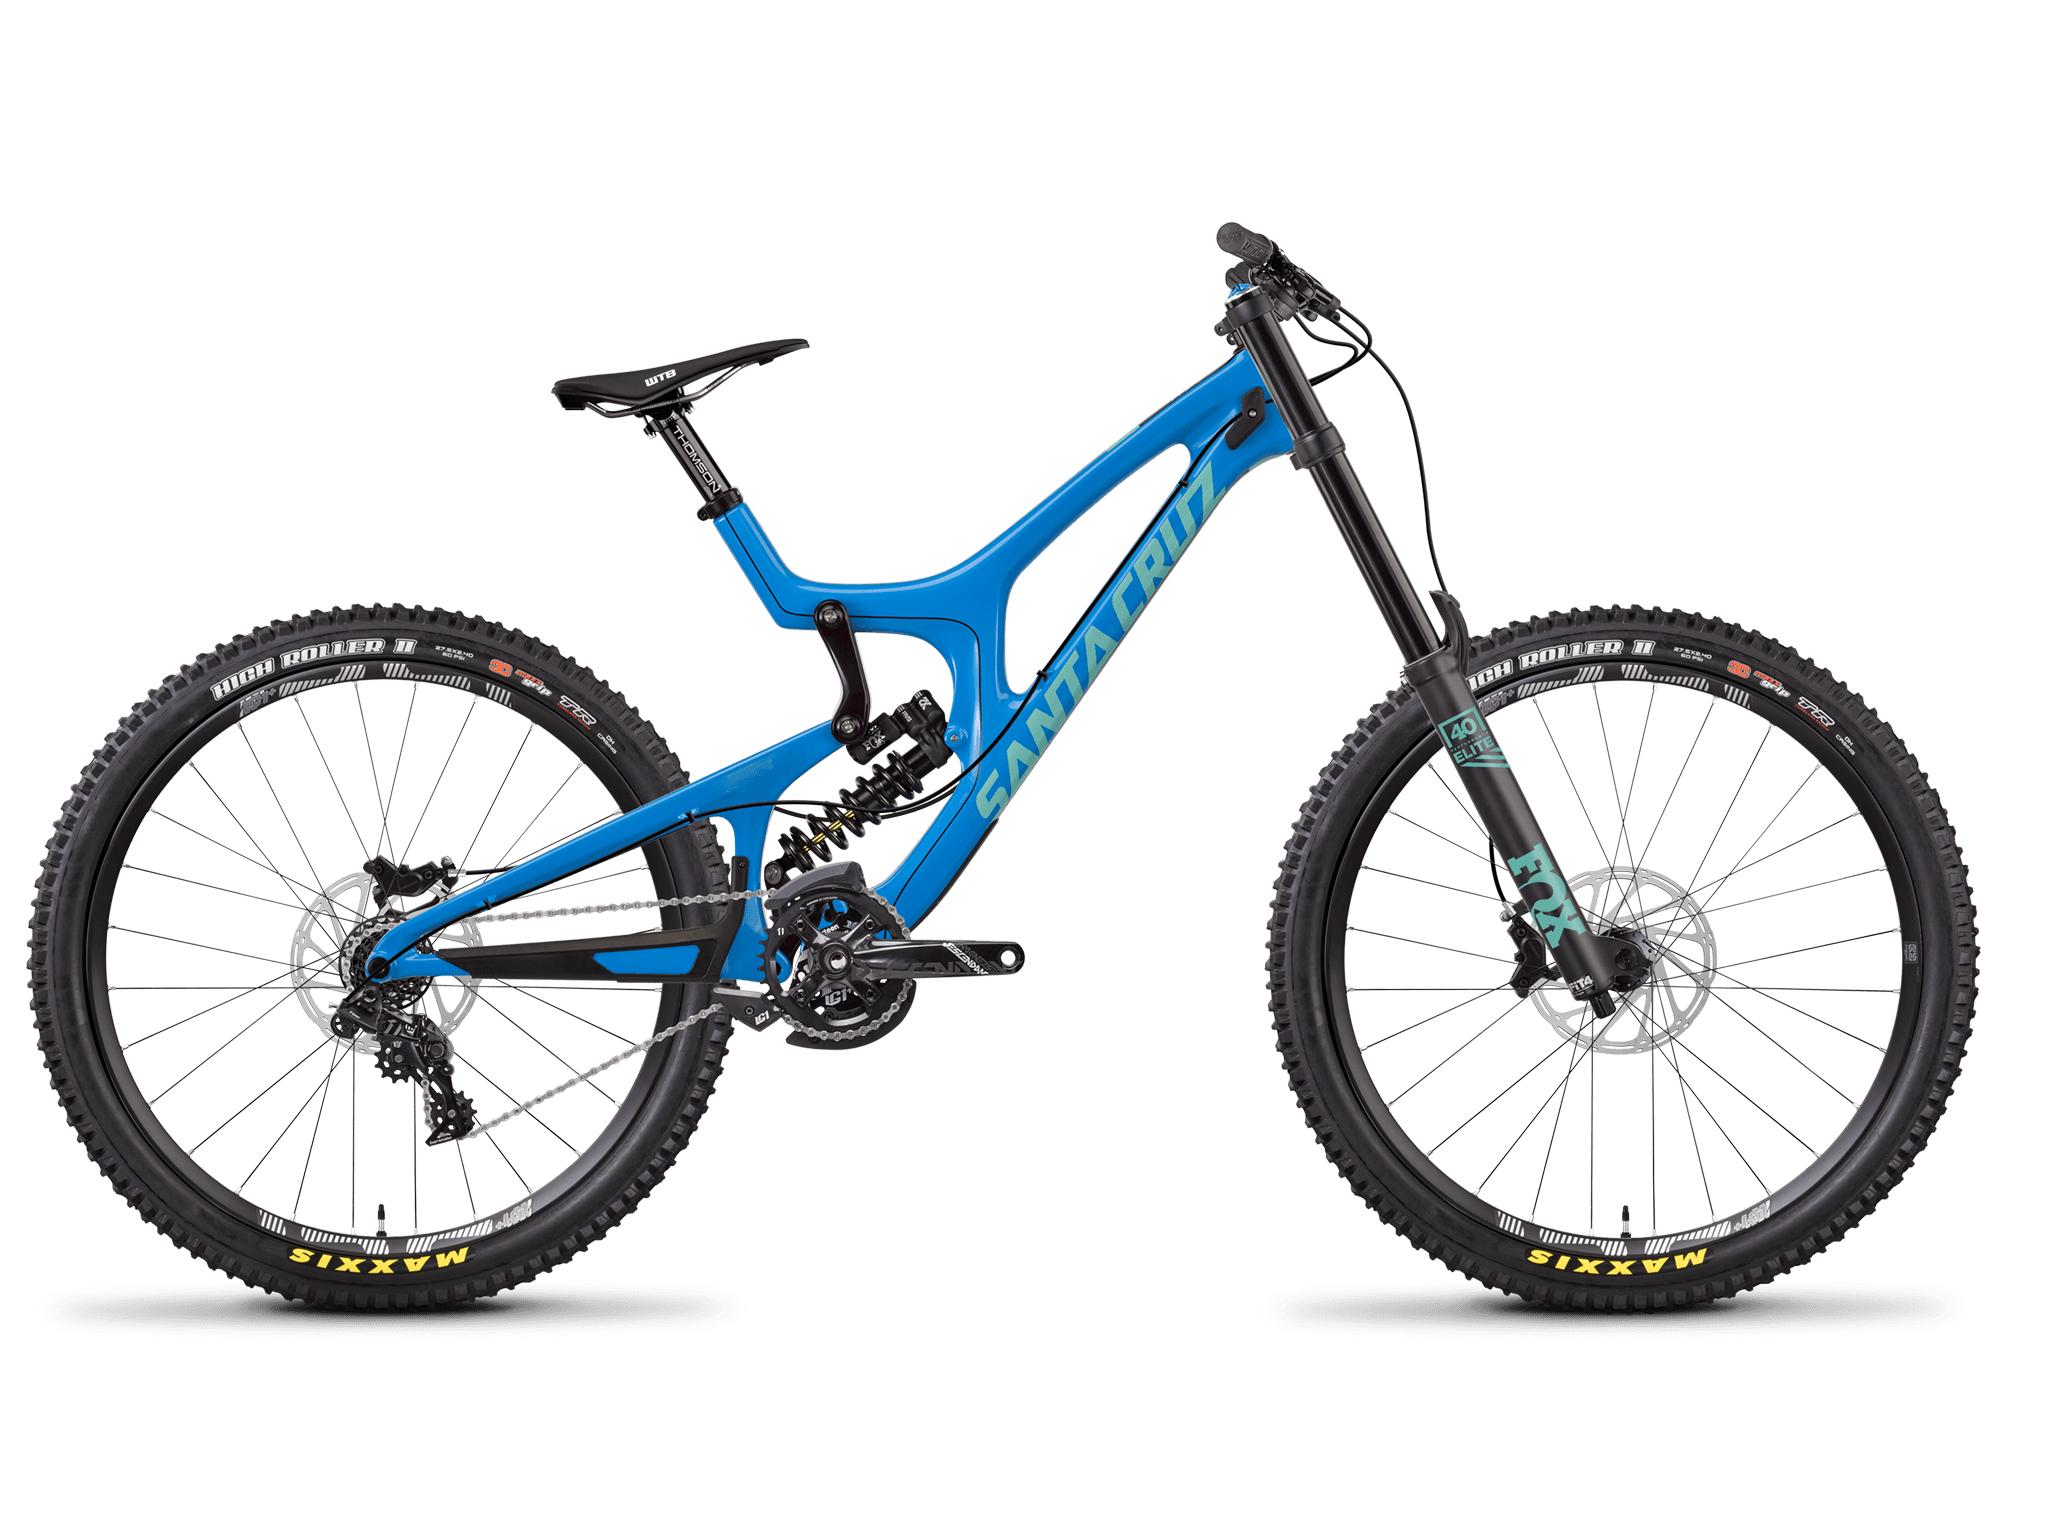 1caa83f1d91 Santa Cruz V10 DH S Carbon C - Kirkland Bicycle | Kirkland | WA